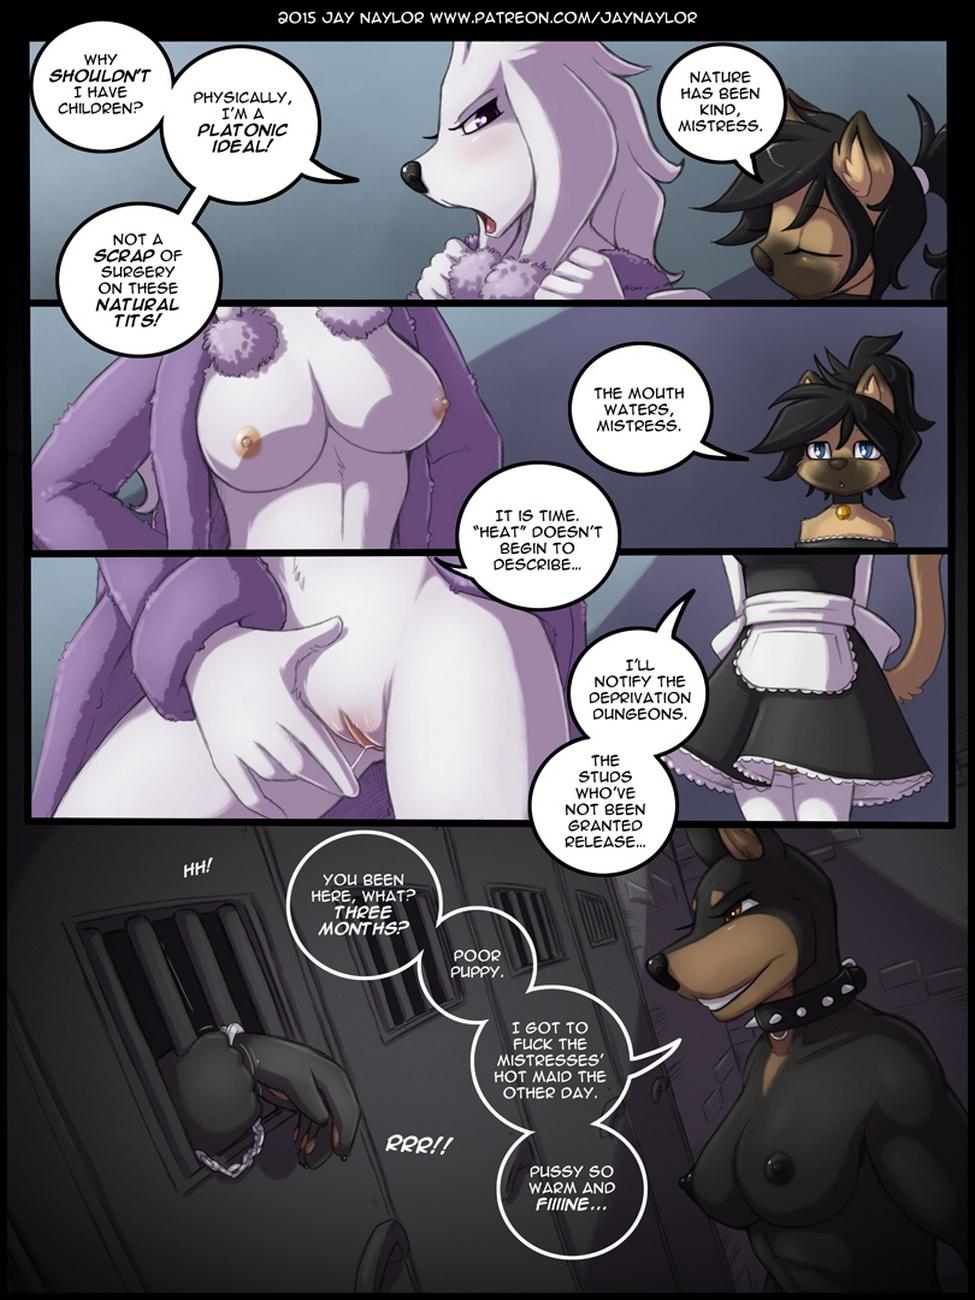 The Best Laid Mistress